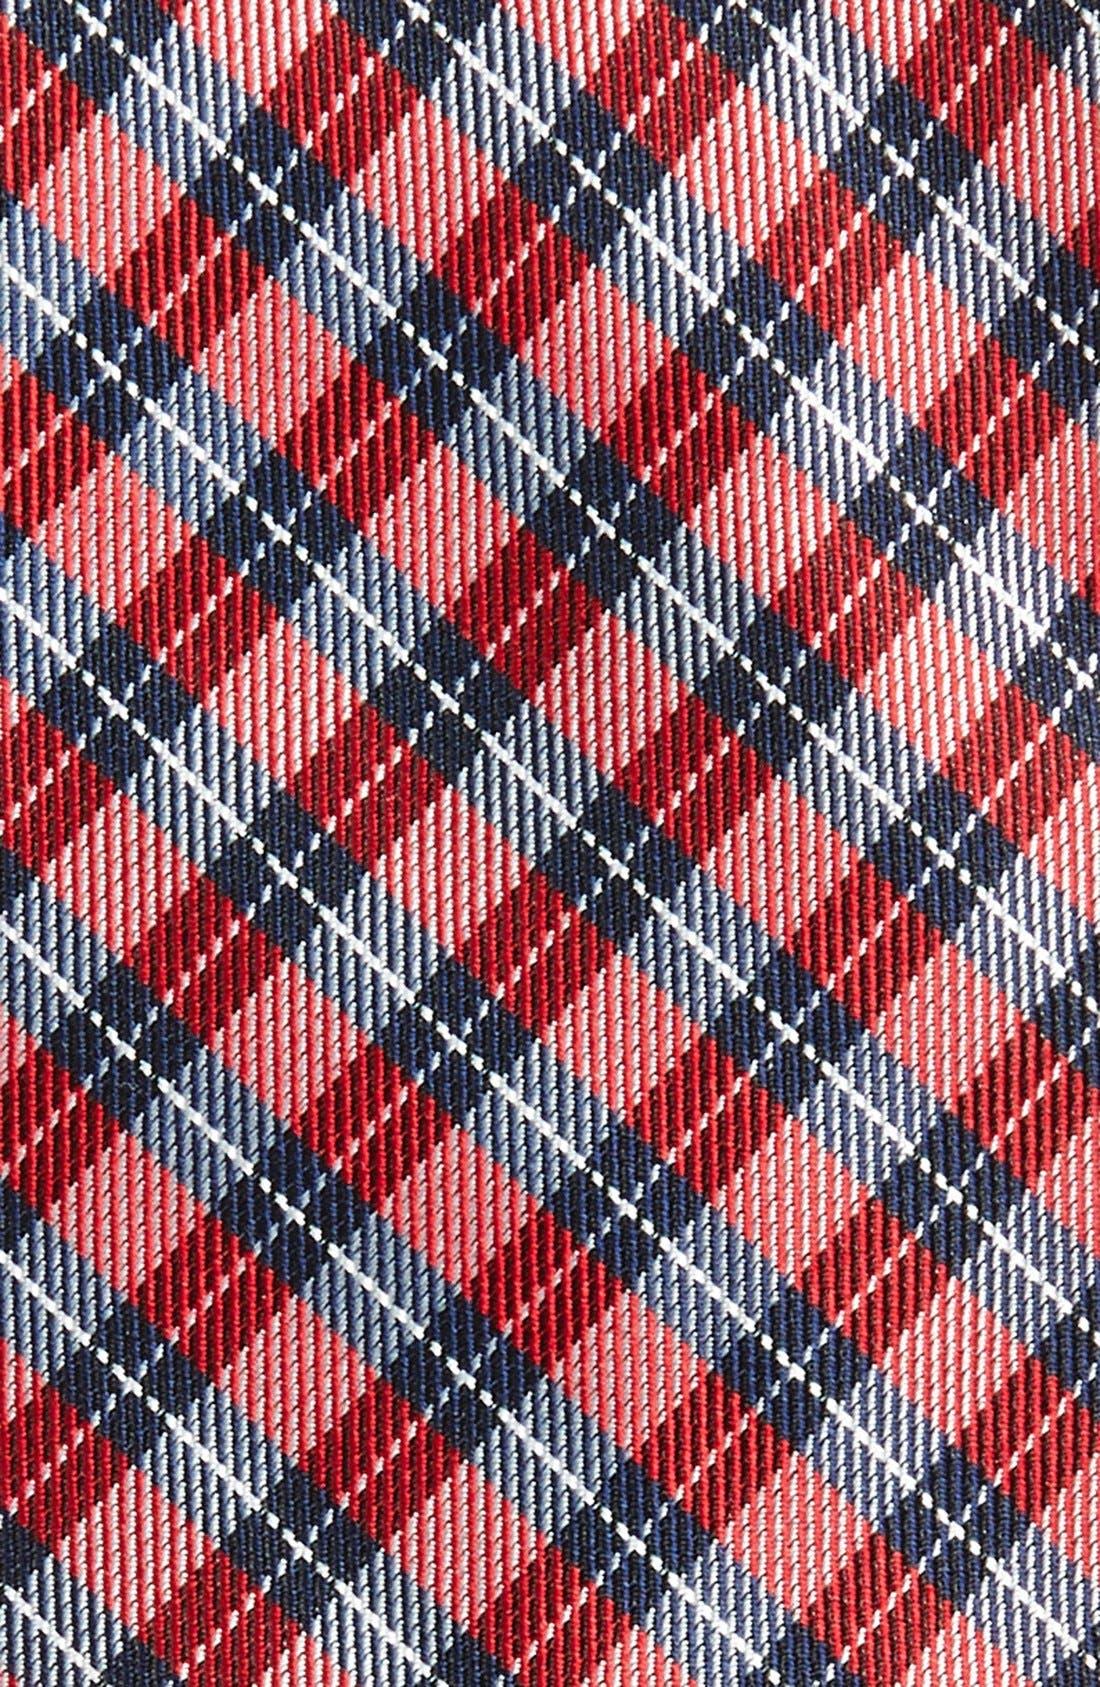 'Choi' Woven Silk Tie,                             Alternate thumbnail 4, color,